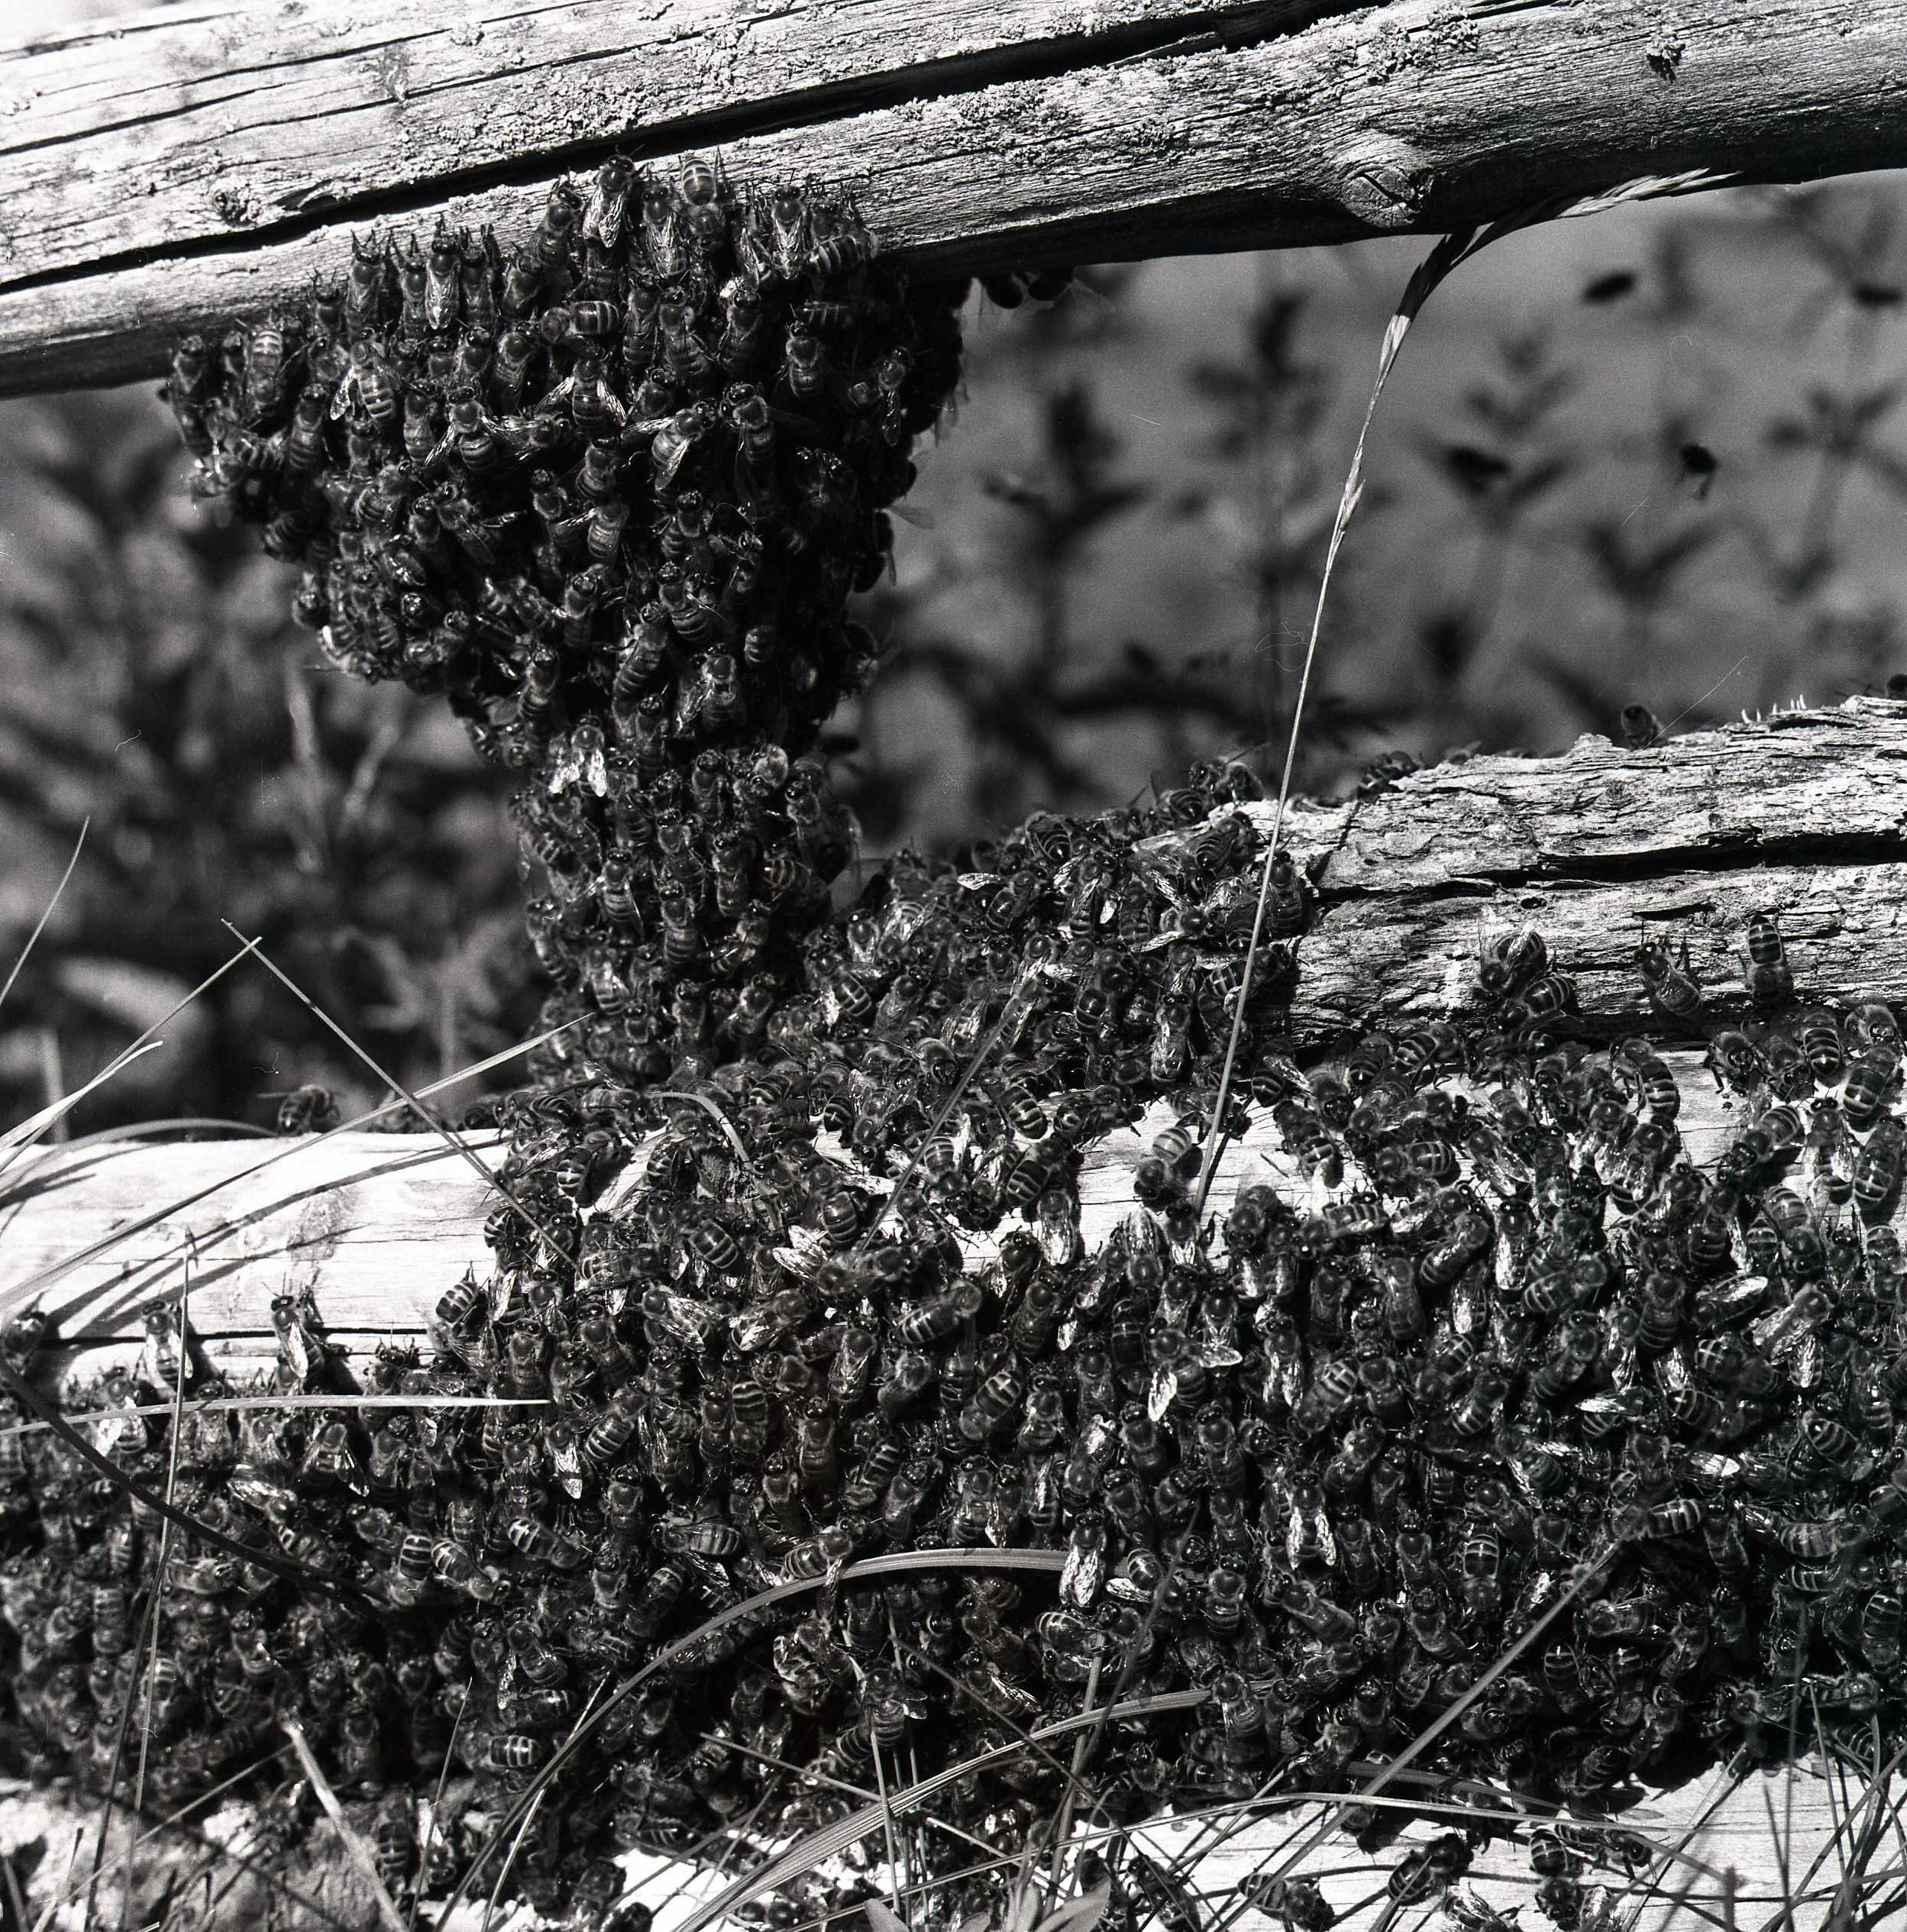 M 115 881: Bisvärm, flygsvärmande, 10 juli 1955. Foto: Hilding Mickelsson©